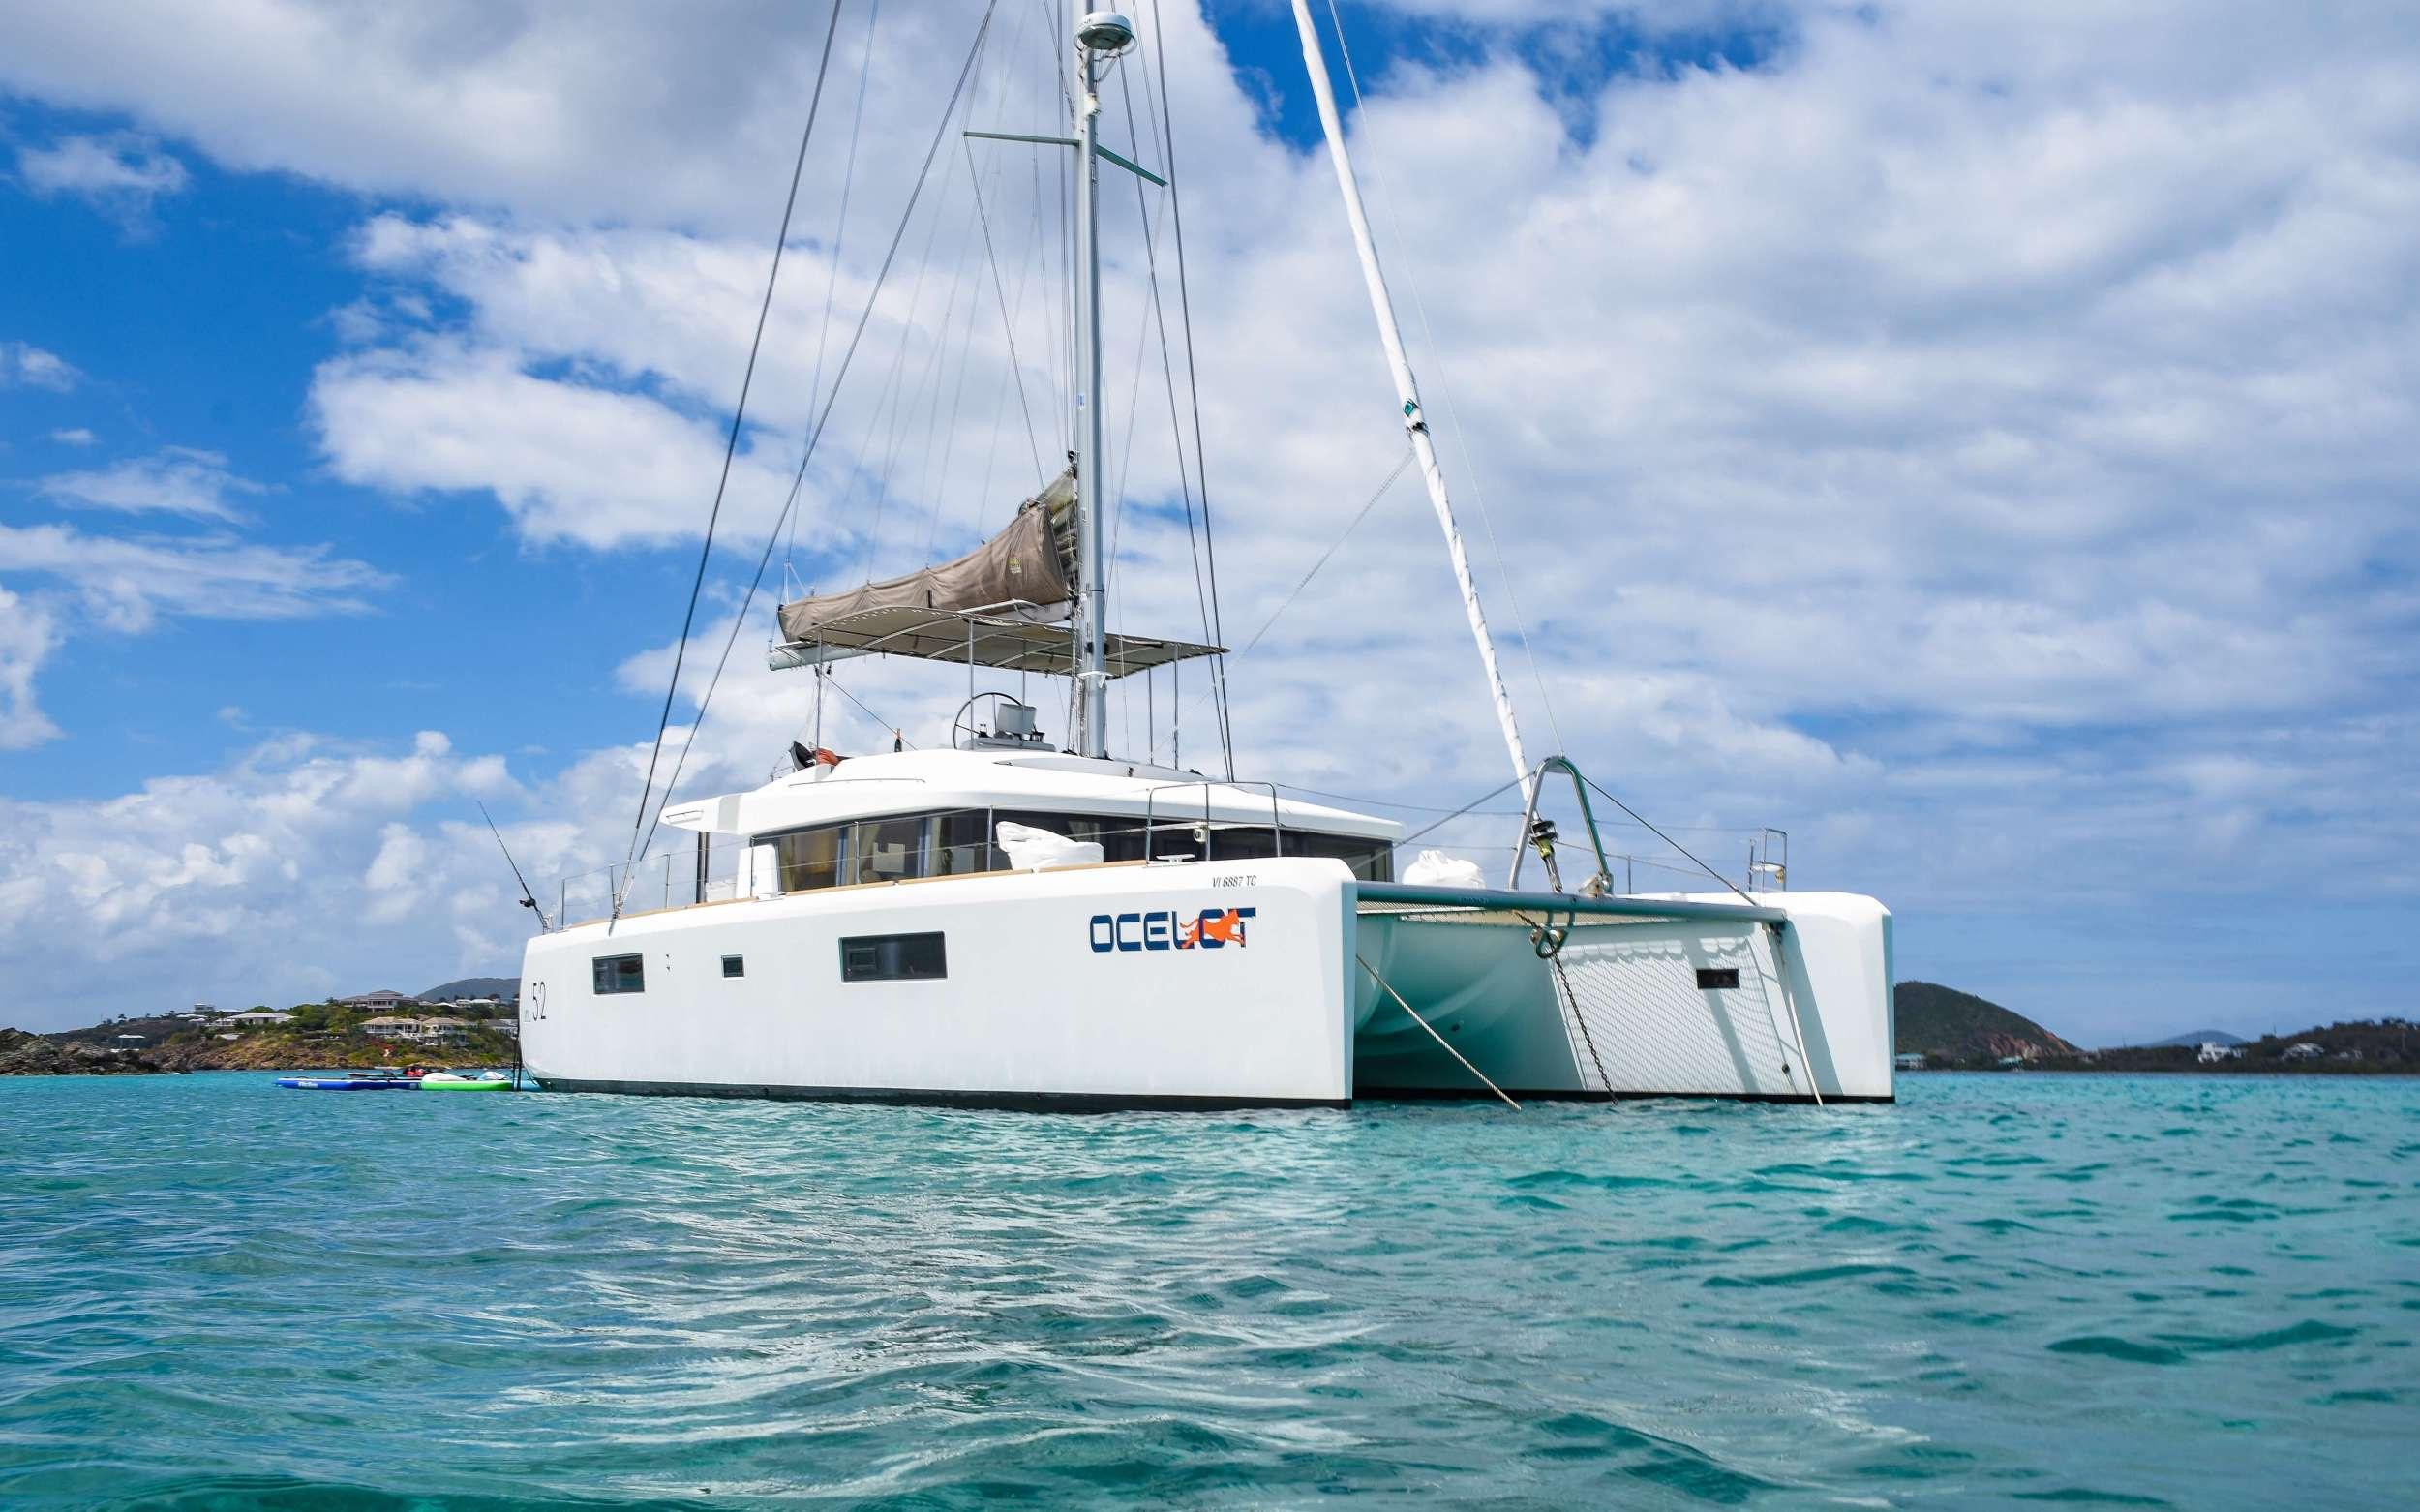 Main image of OCELOT yacht